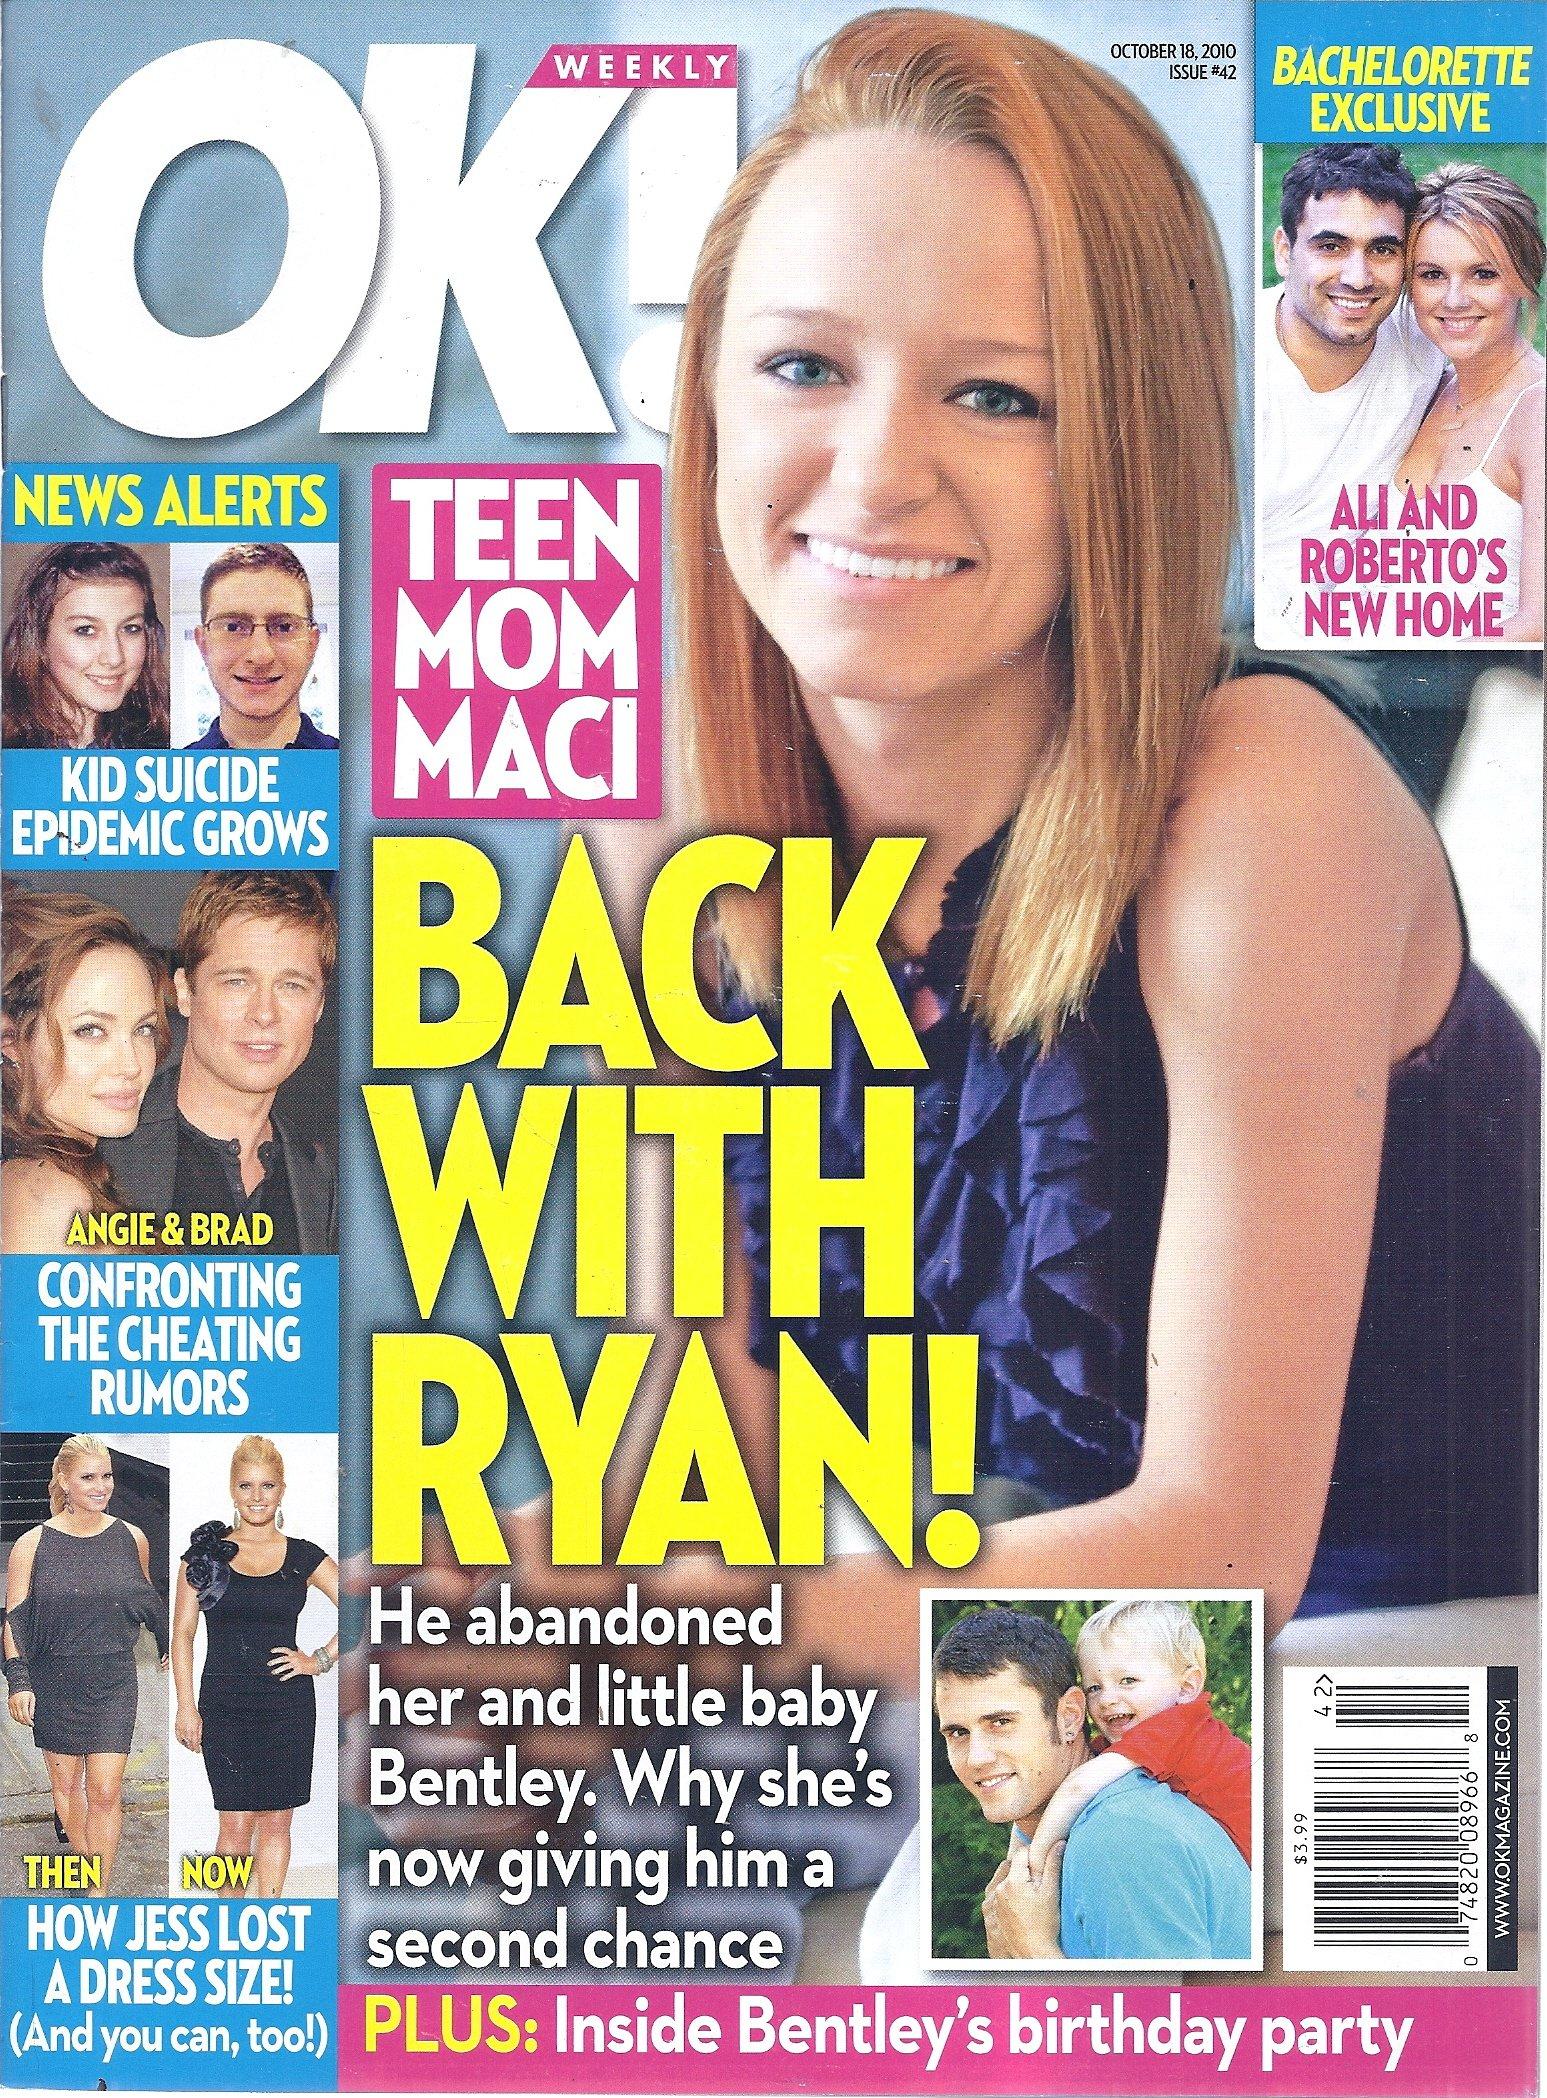 Download OK! Weekly Magazine (Issue #42 - October 18, 2010 - Maci Bookout, Ryan Edwards, Kyle King) PDF